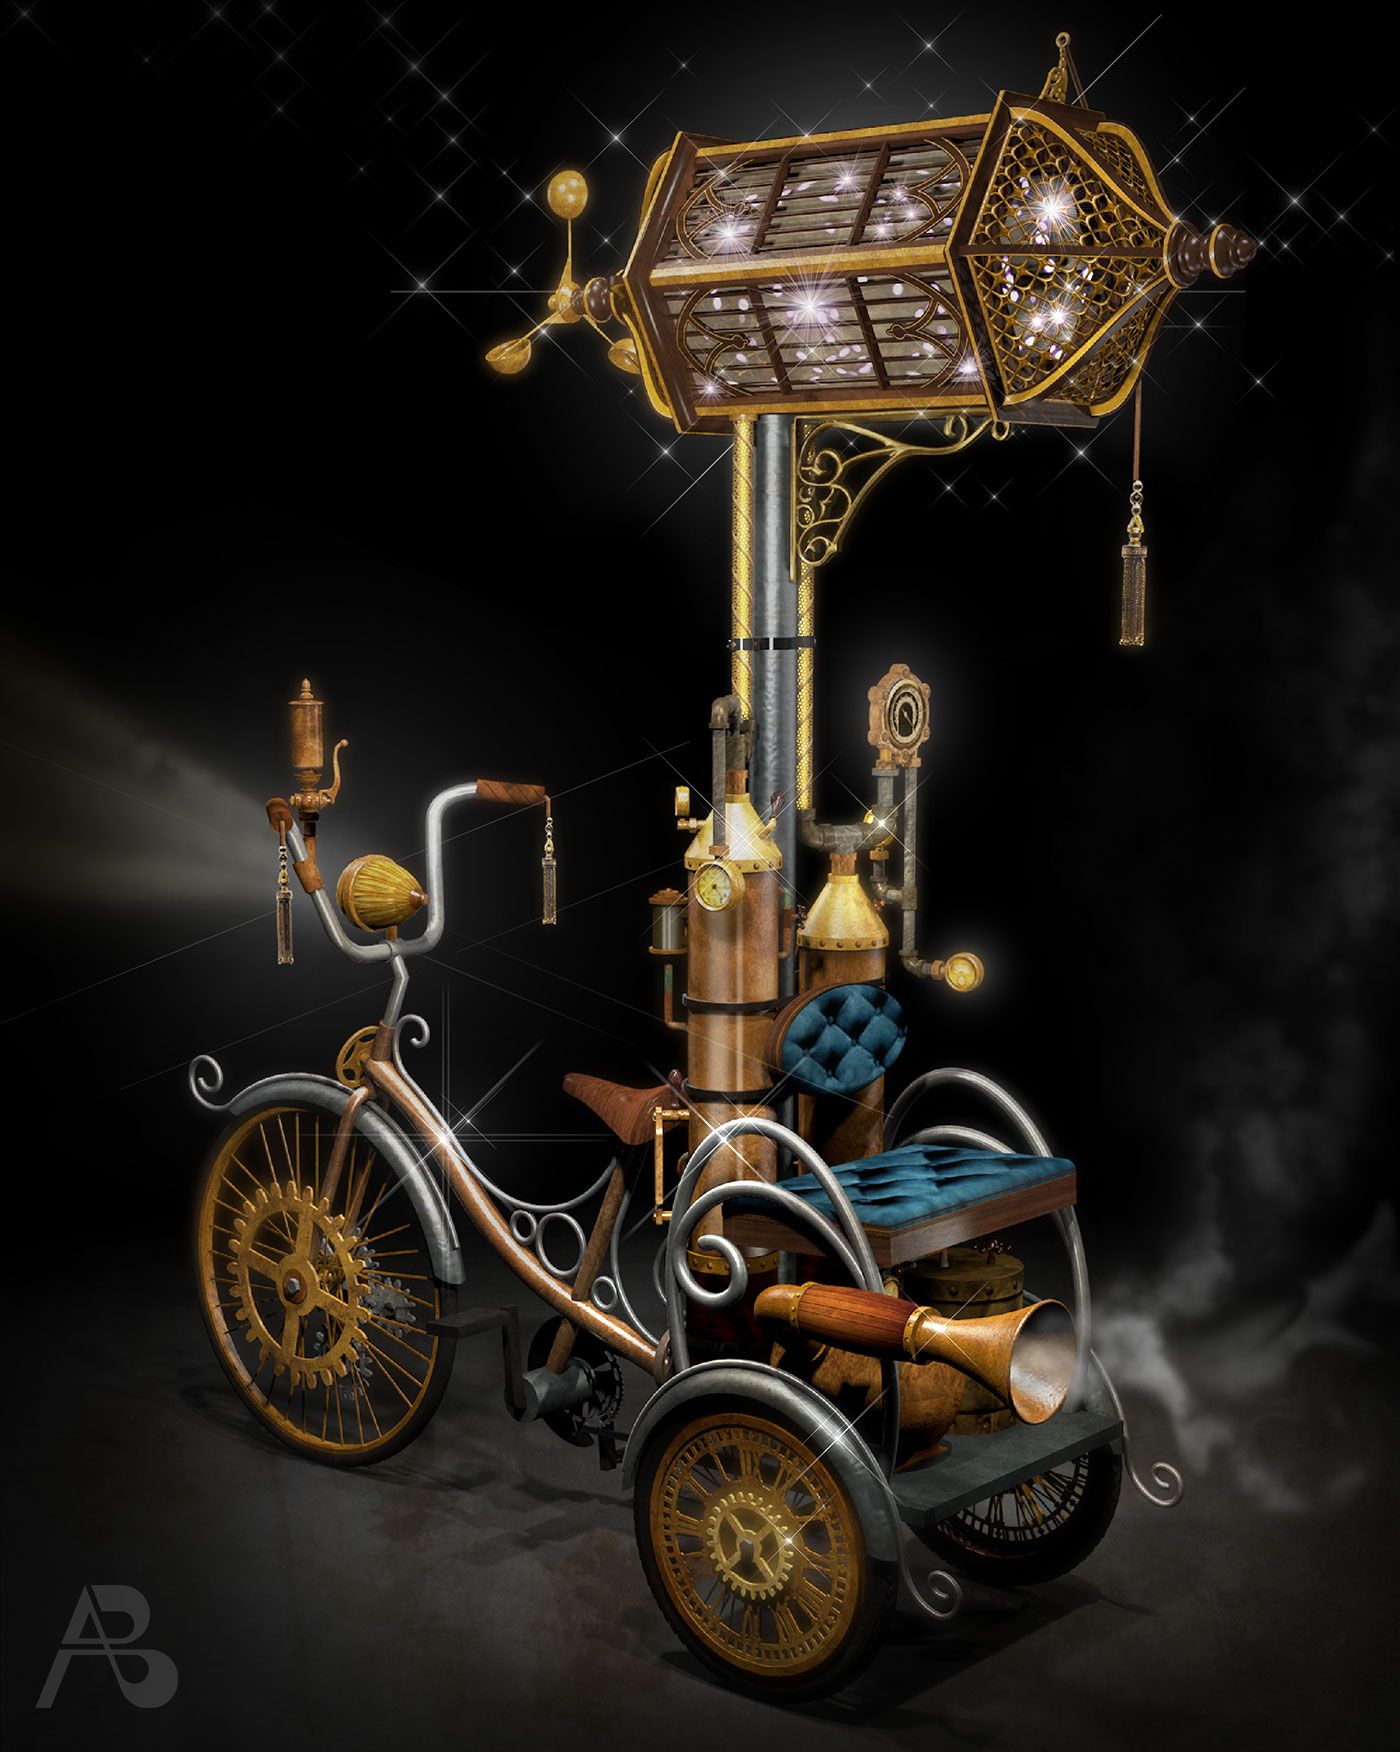 andy-broomell-chronocycle-back-digital-rendering-vectorworks-photoshop-firefiles-steampunk-bicycle-machine.jpg